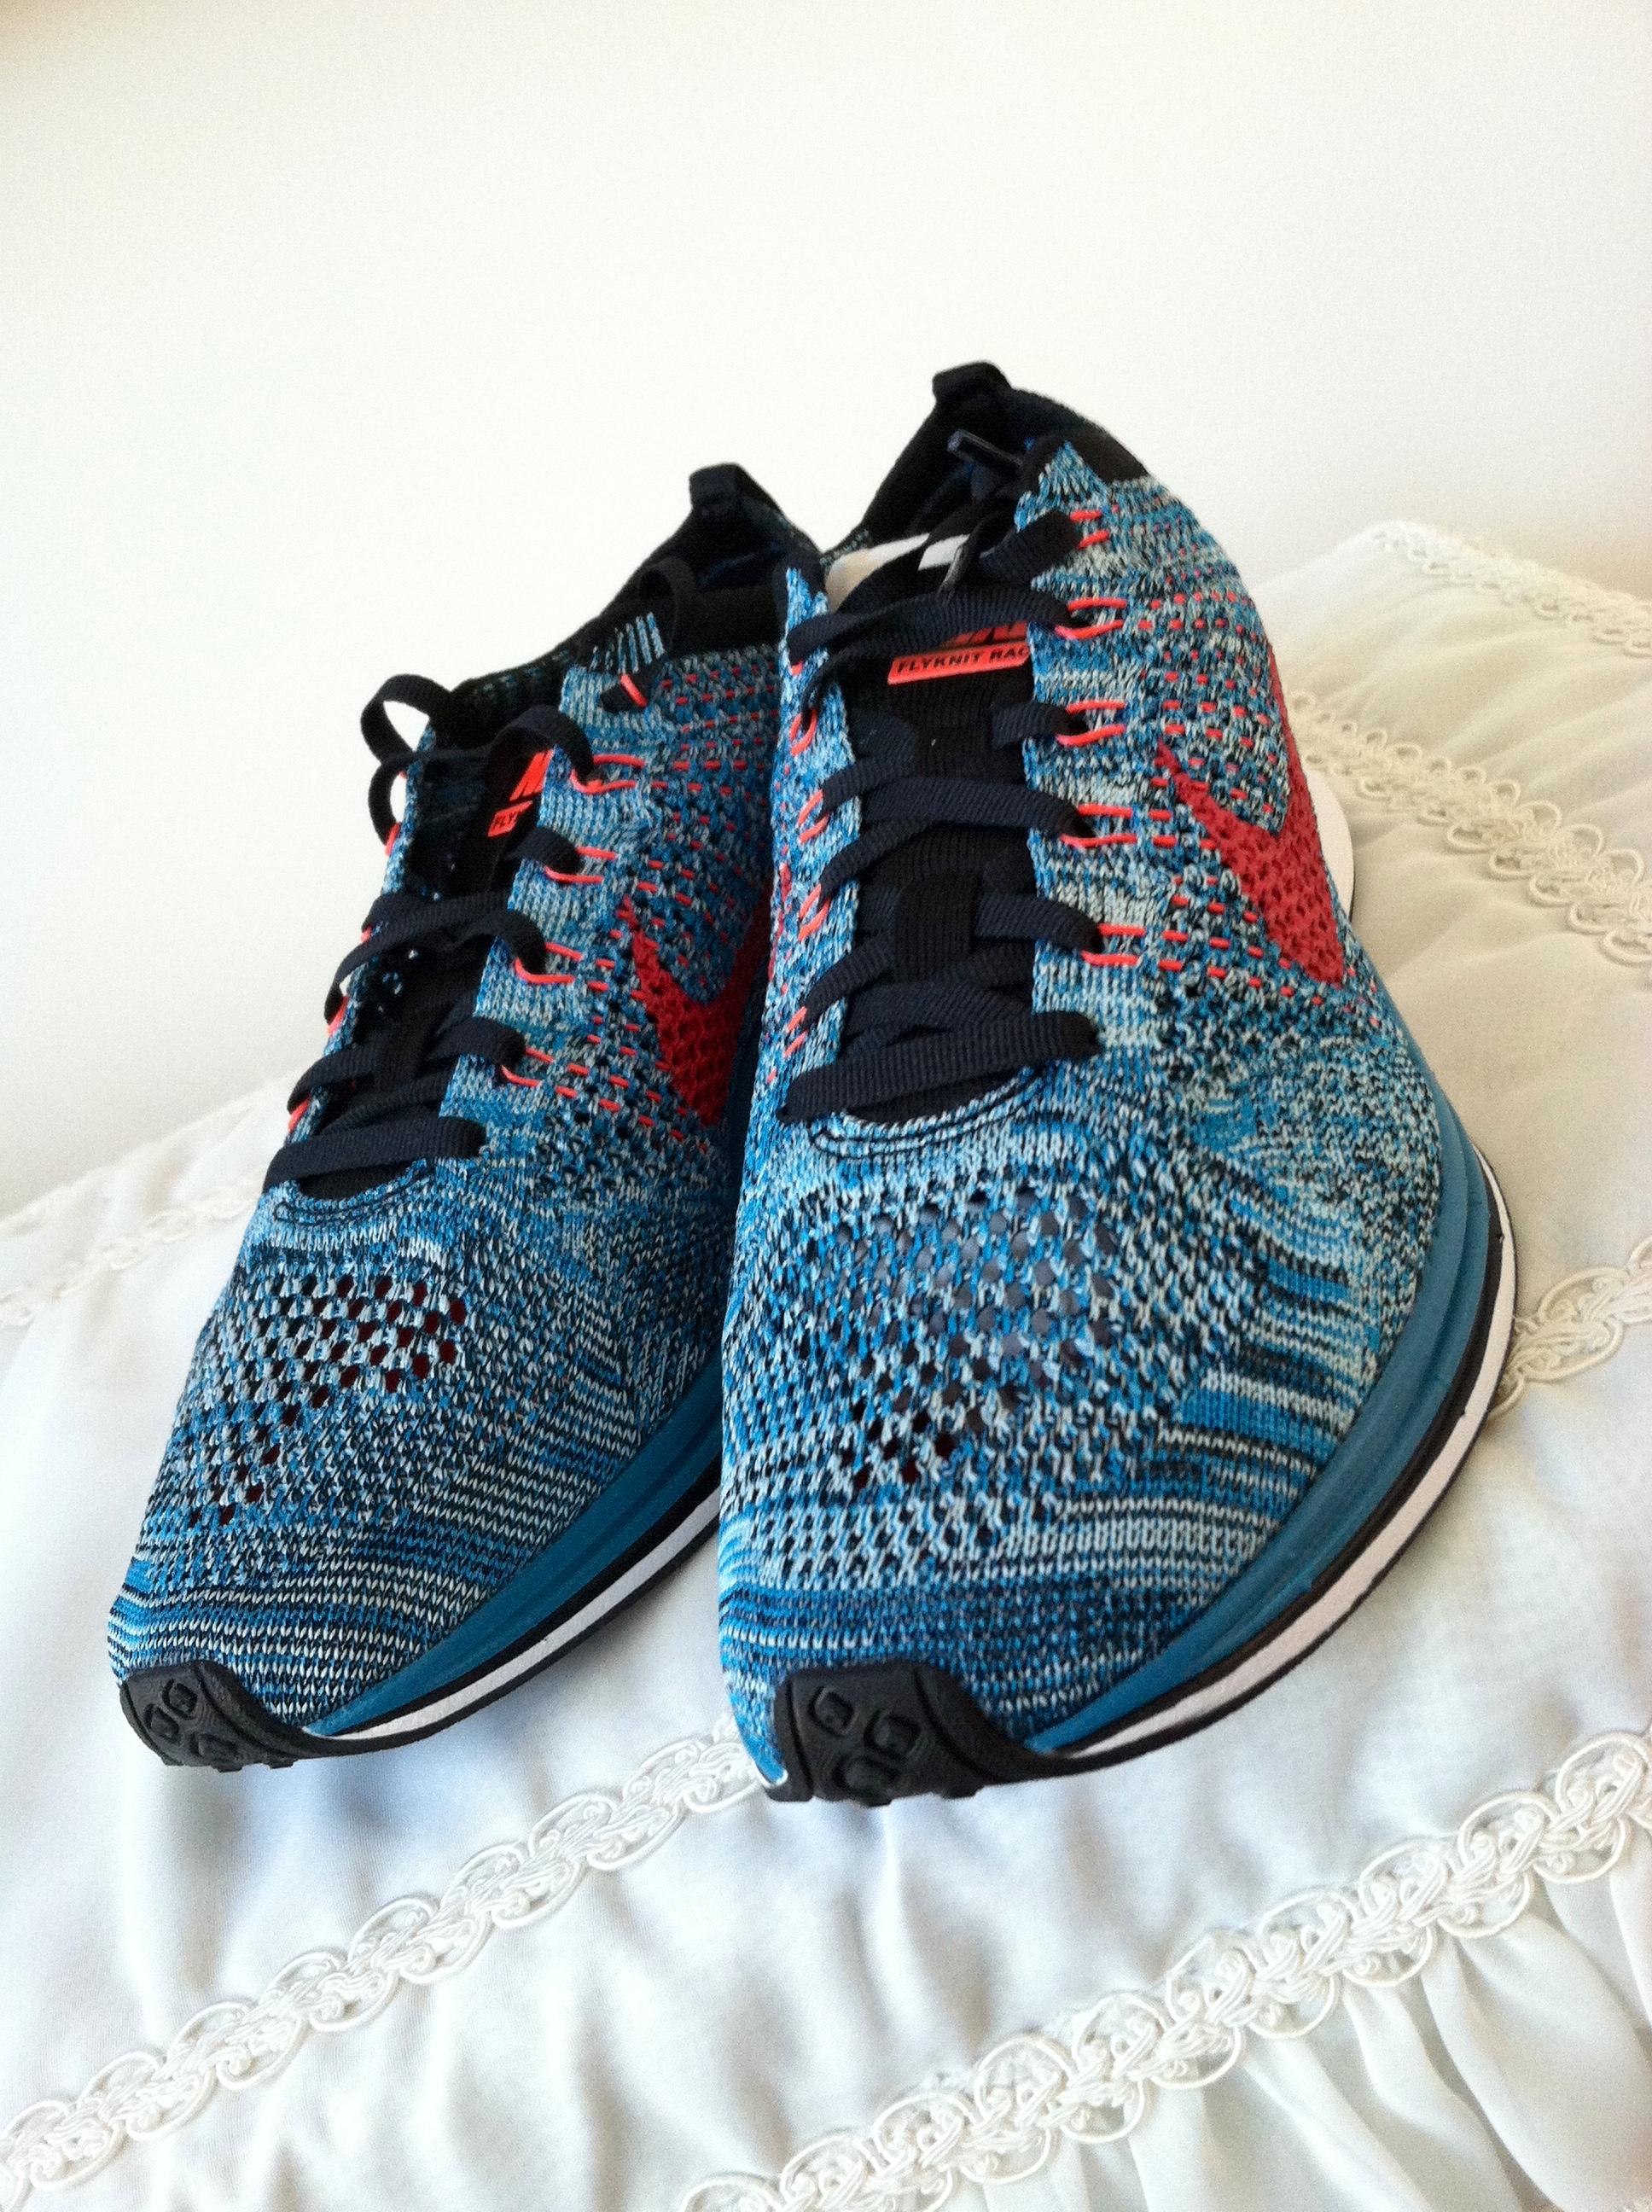 1eed66b3c07c Nike Nike Flyknit Racer Neo Turquoise Bright Crimson Glacier 526628-404  Multi Rainbow